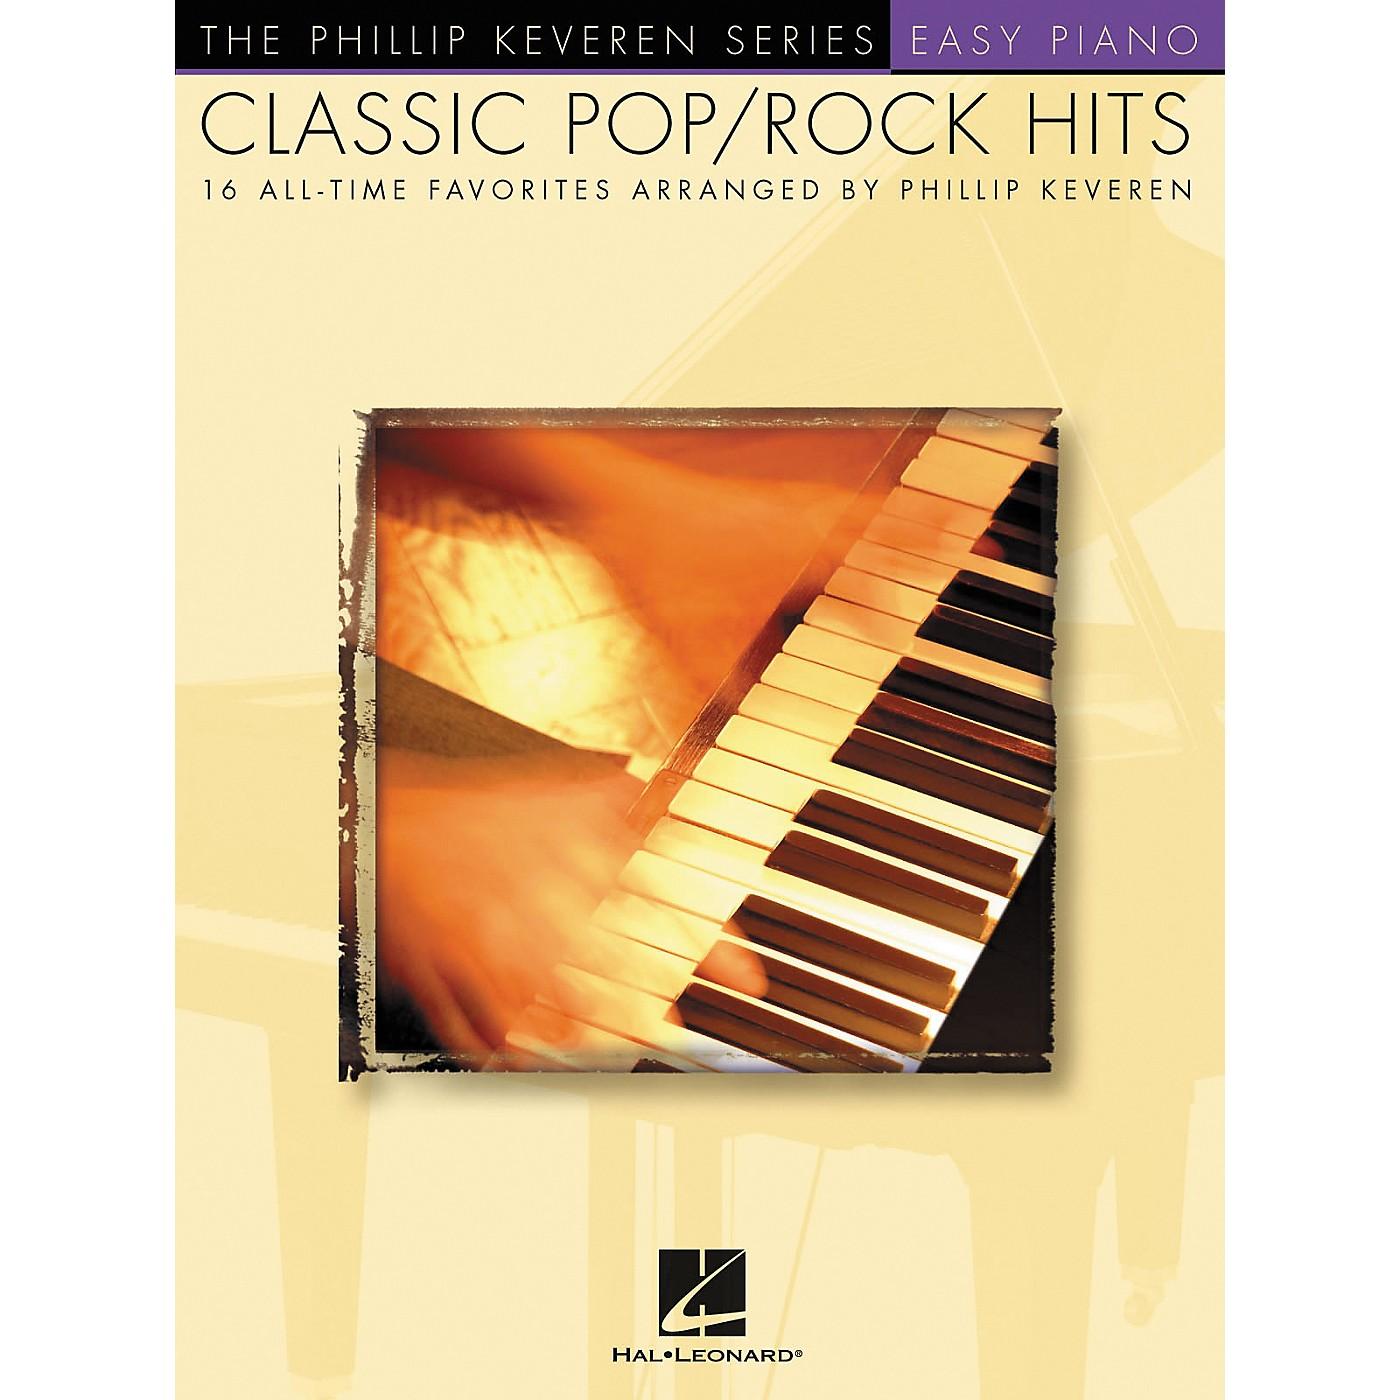 Hal Leonard Classic Pop/Rock Piano Hits - Phillip Keveren Series For Easy Piano thumbnail